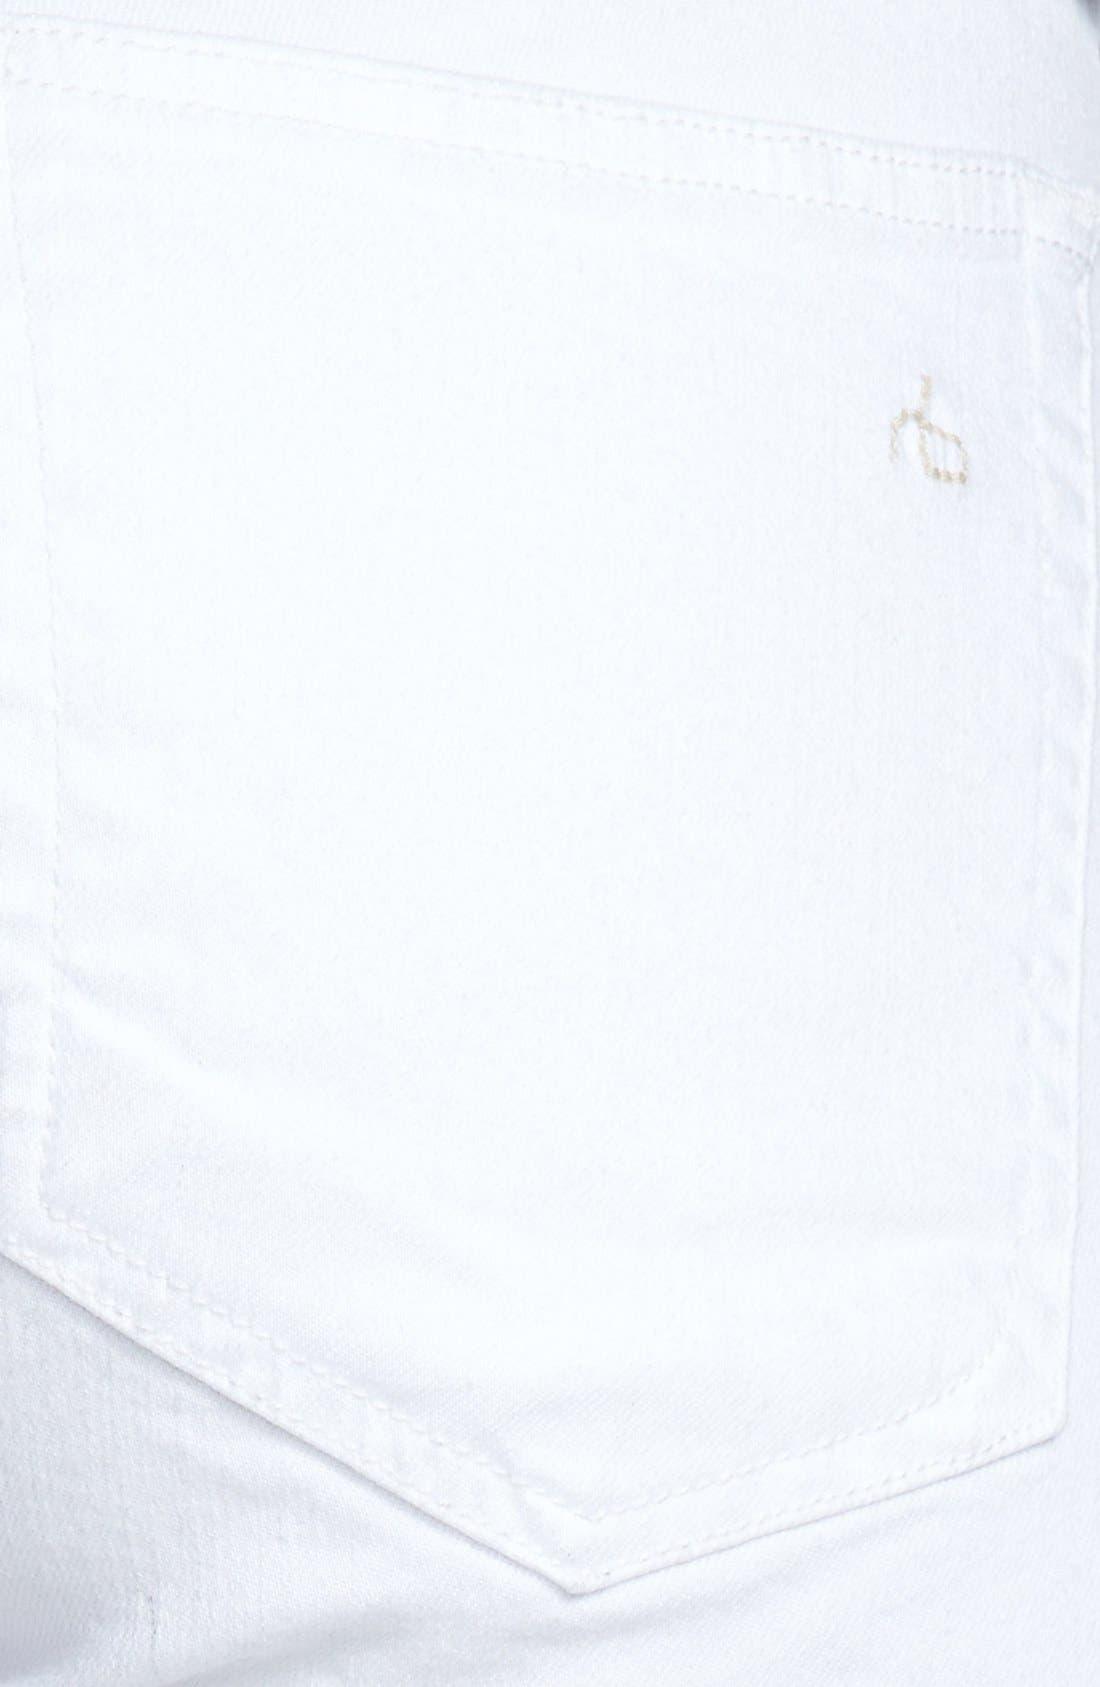 'The Dre' Skinny Jeans,                             Alternate thumbnail 10, color,                             BRIGHT WHITE